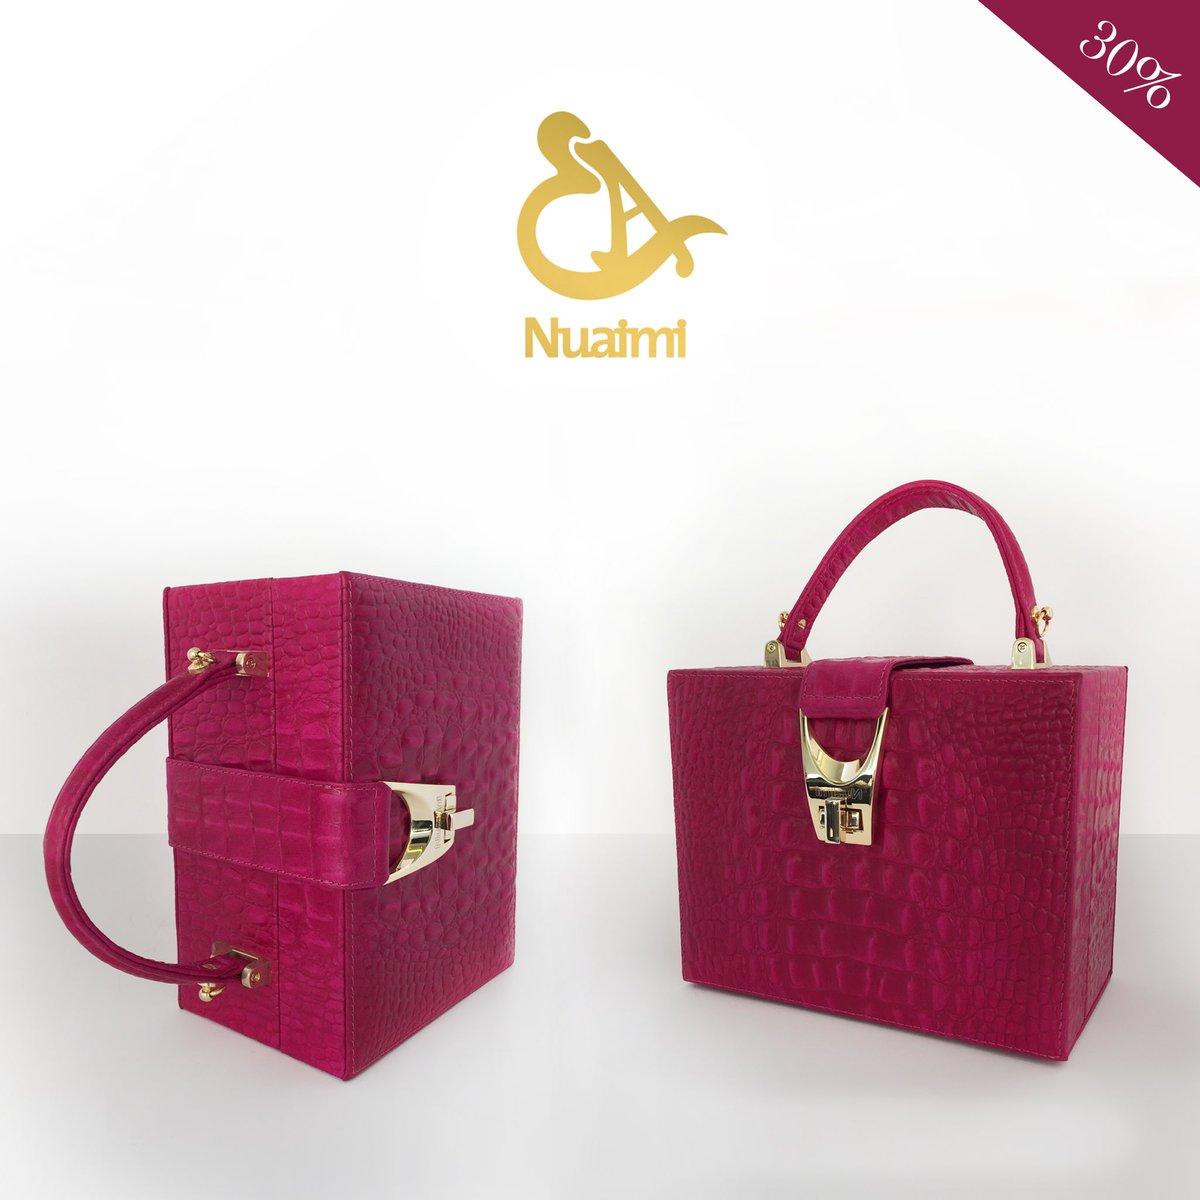 On sale -30% !  Nuaimi box bag   #nuaimi #handbag #uae #abudhabi #dubai #fashion #shopping #oman #kuwait #saudi #bahrain #lebanon #jordan <br>http://pic.twitter.com/u1nZDY7l9D